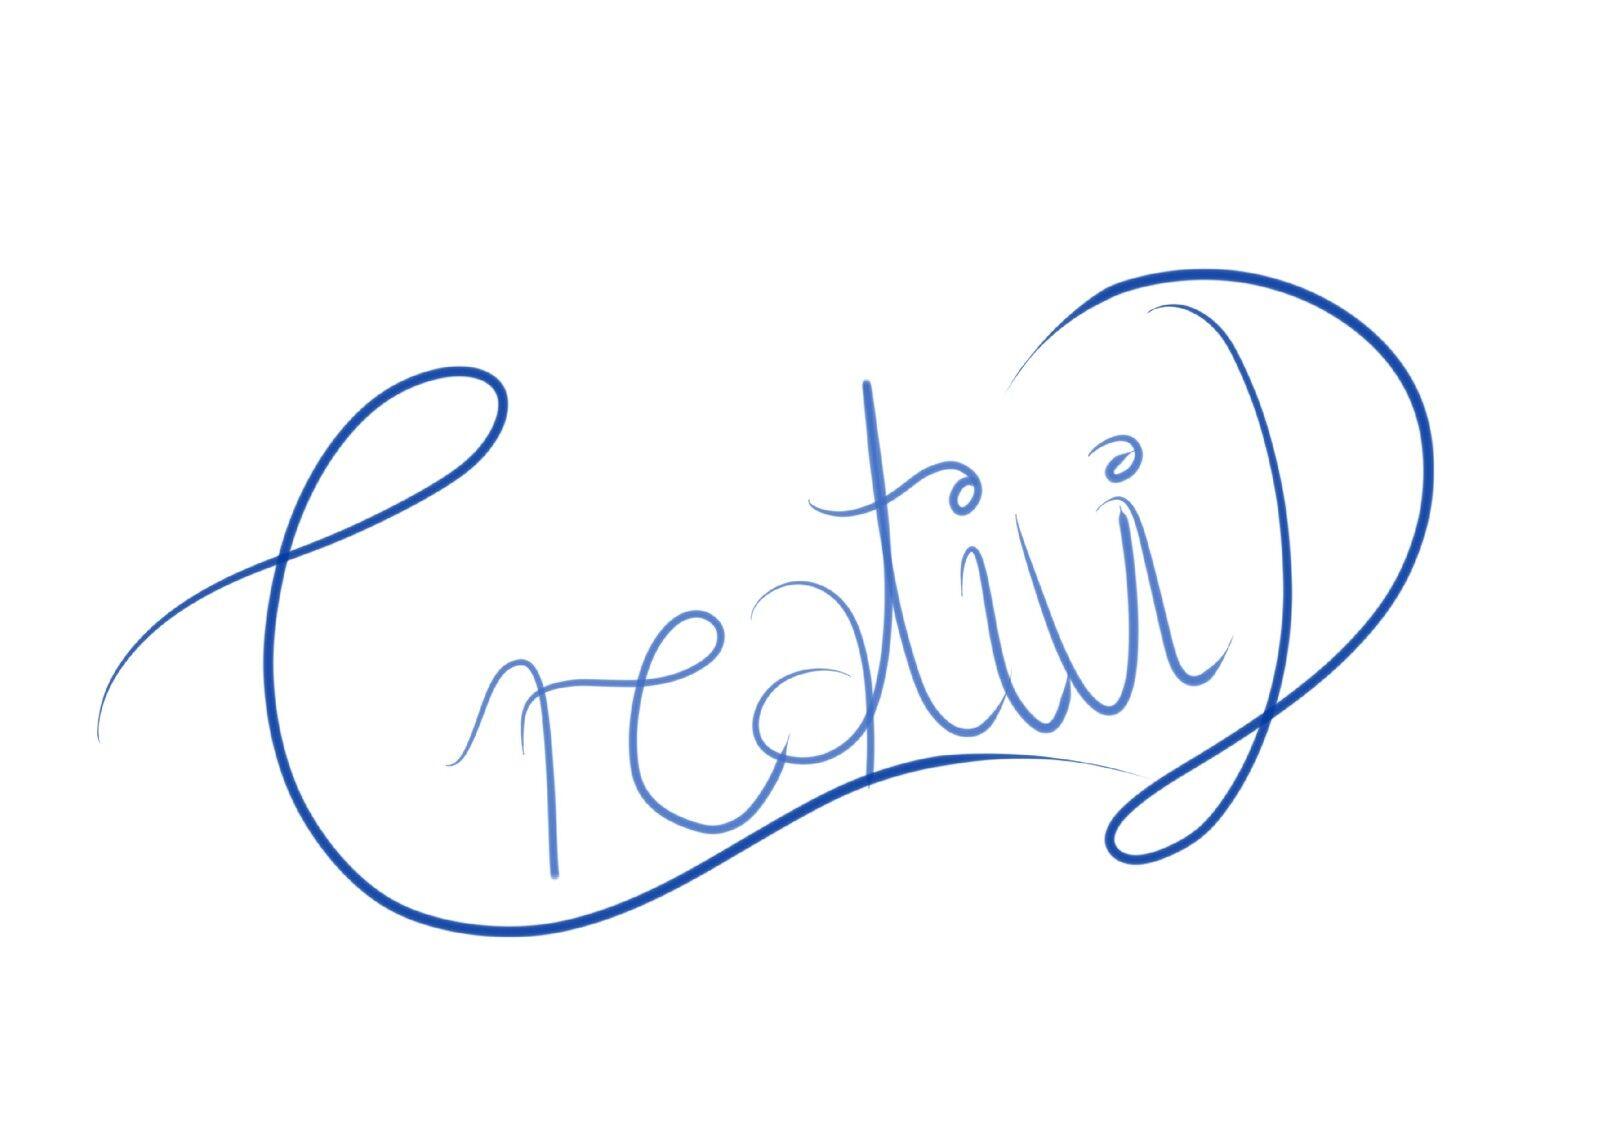 CreativiD